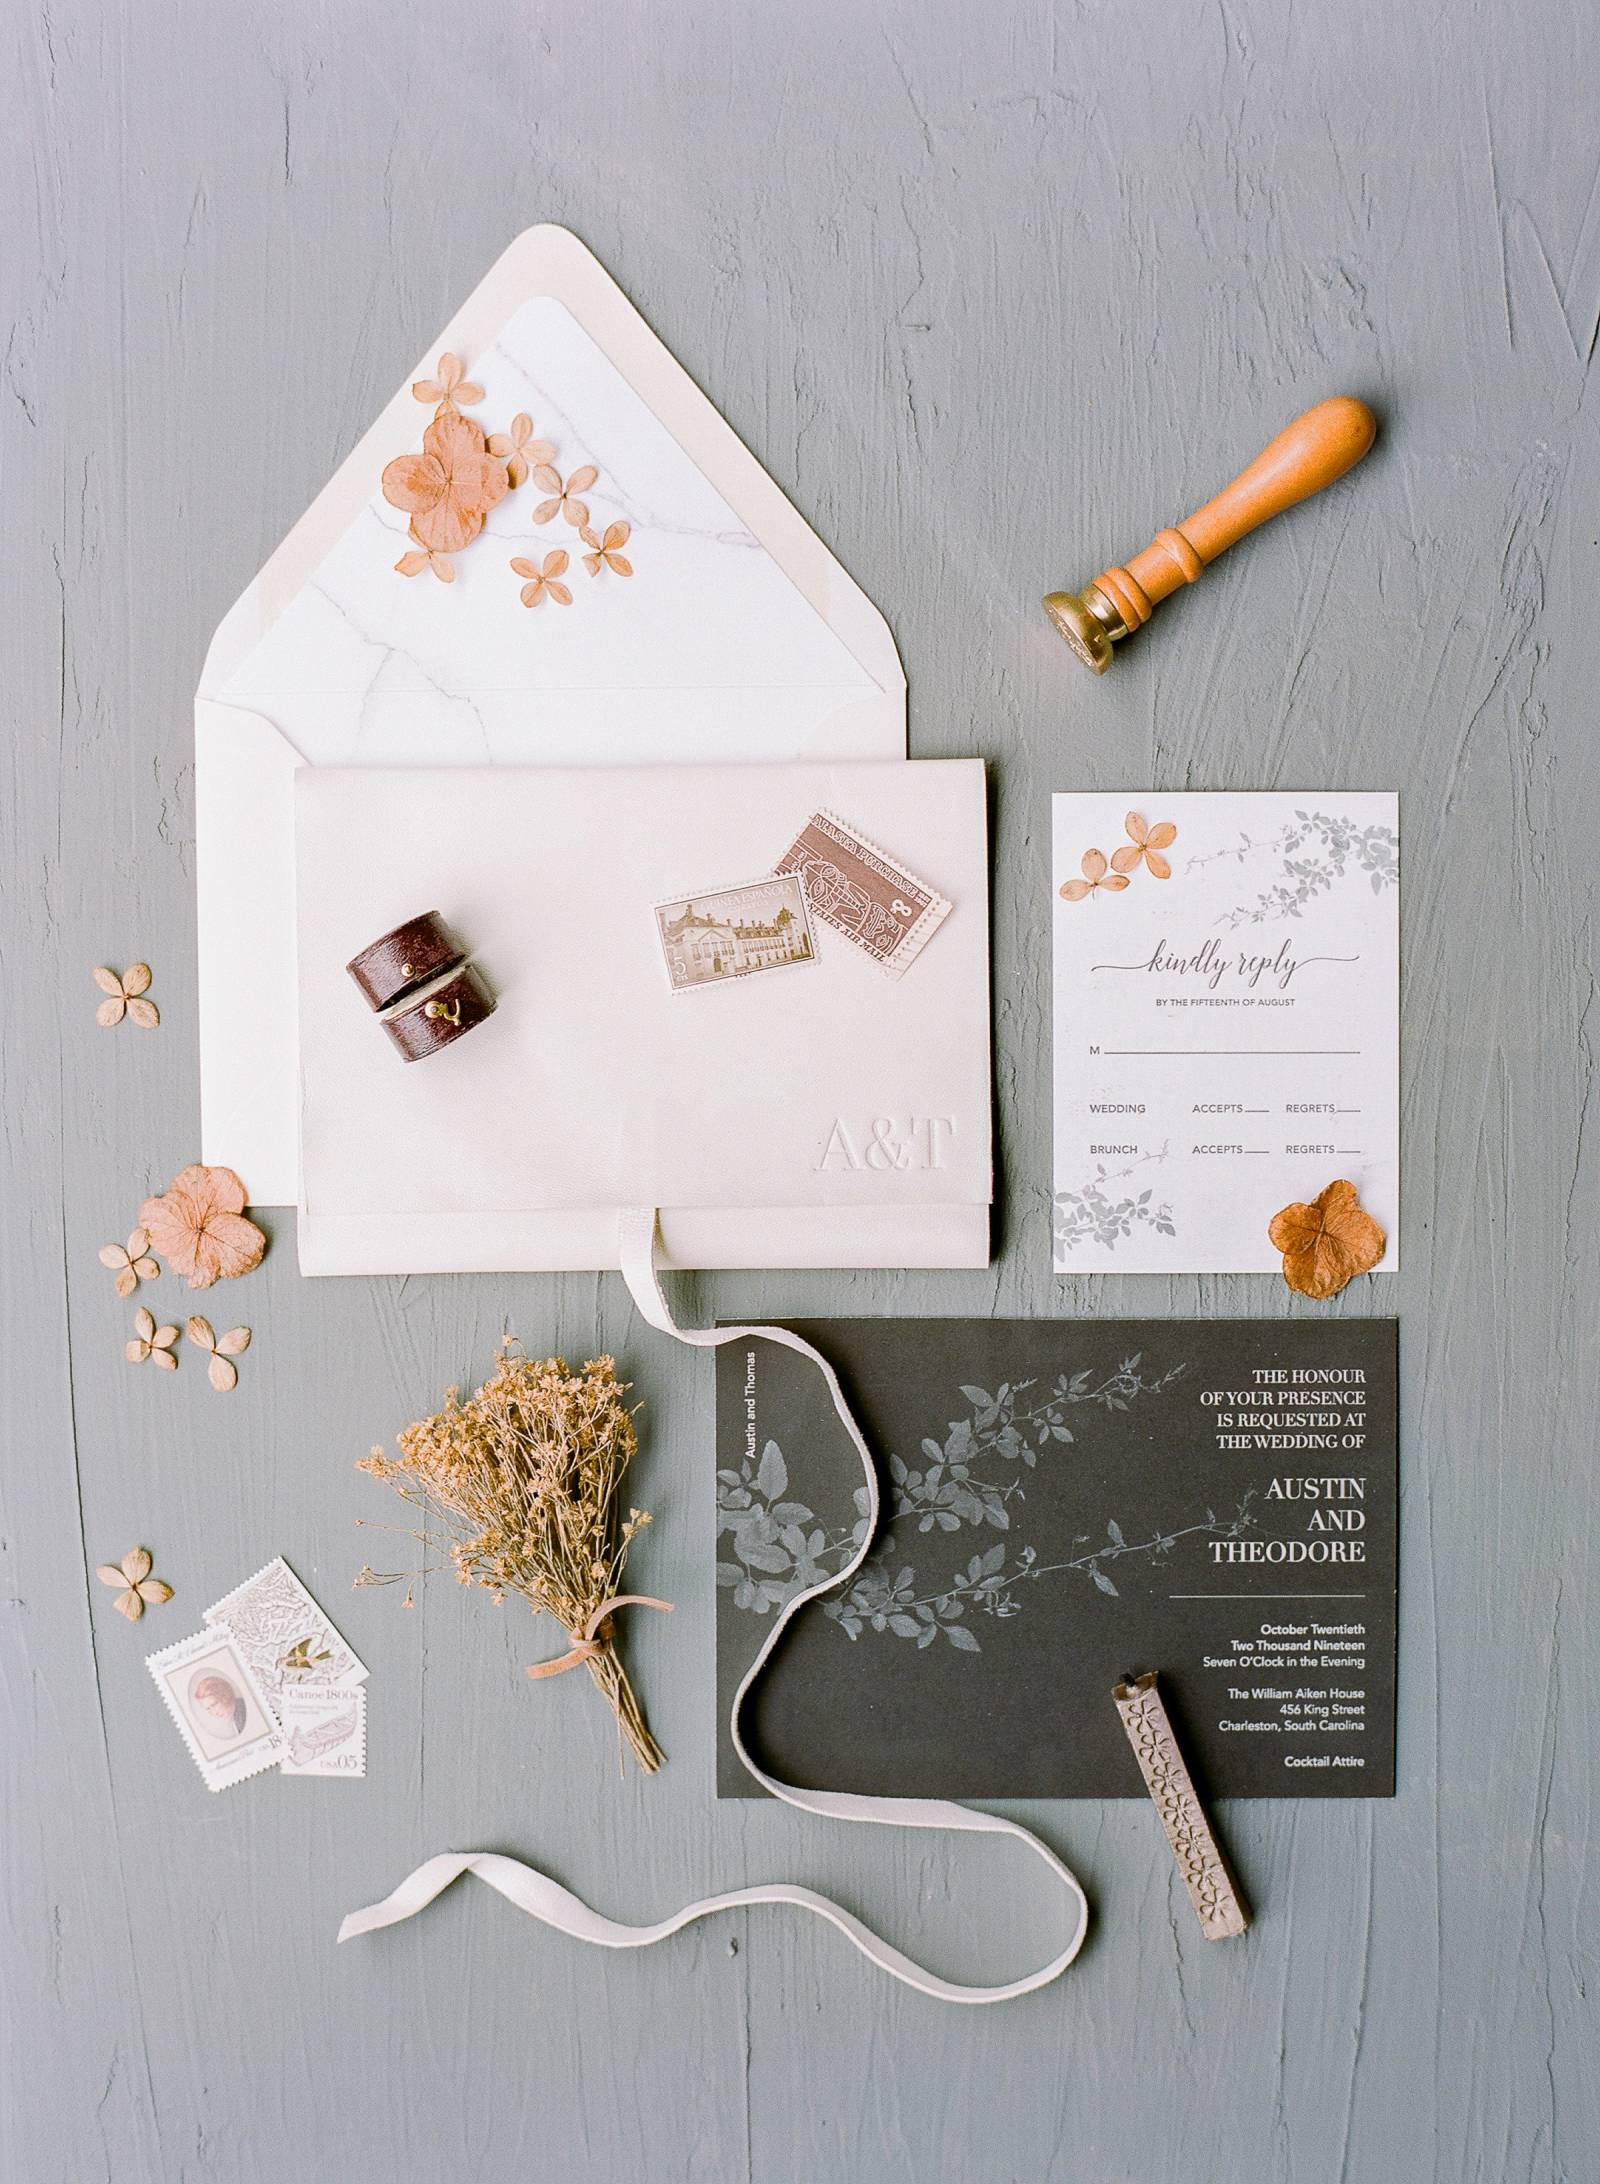 Masculine wedding ideas from Charleston | Charleston Wedding